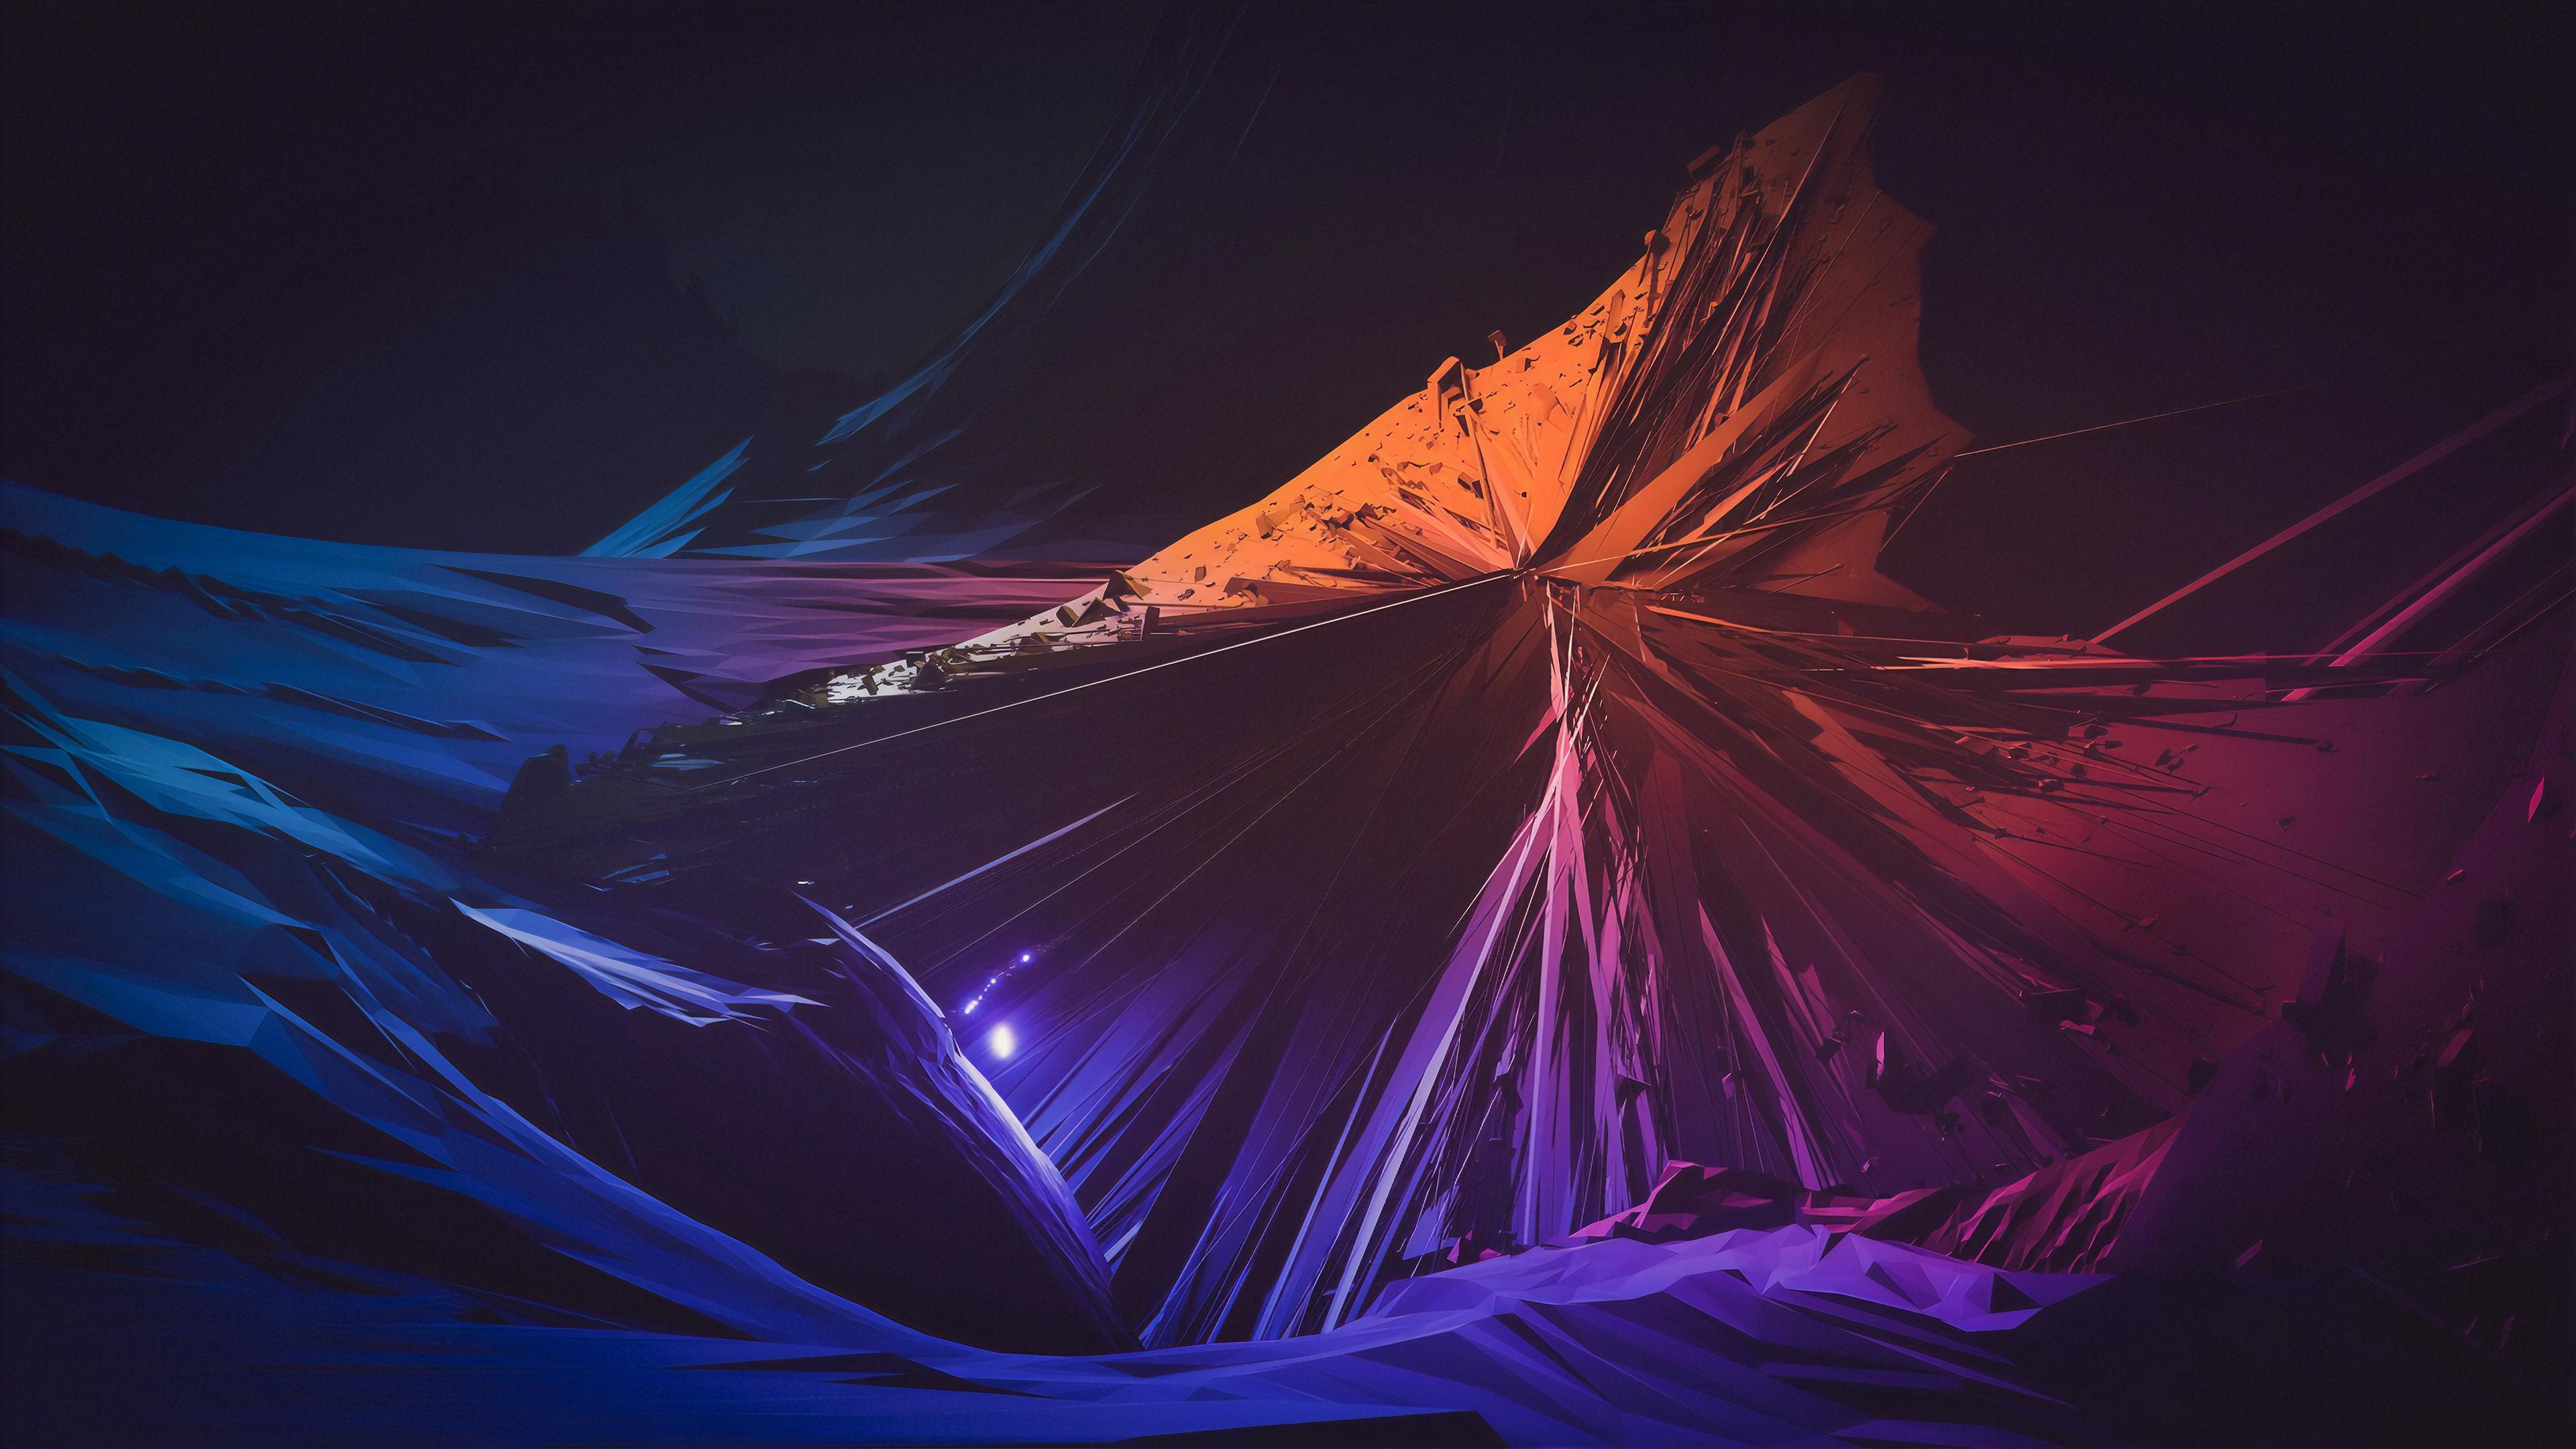 Sharp Shapes Abstract 4k, HD Abstract, 4k Wallpapers ...